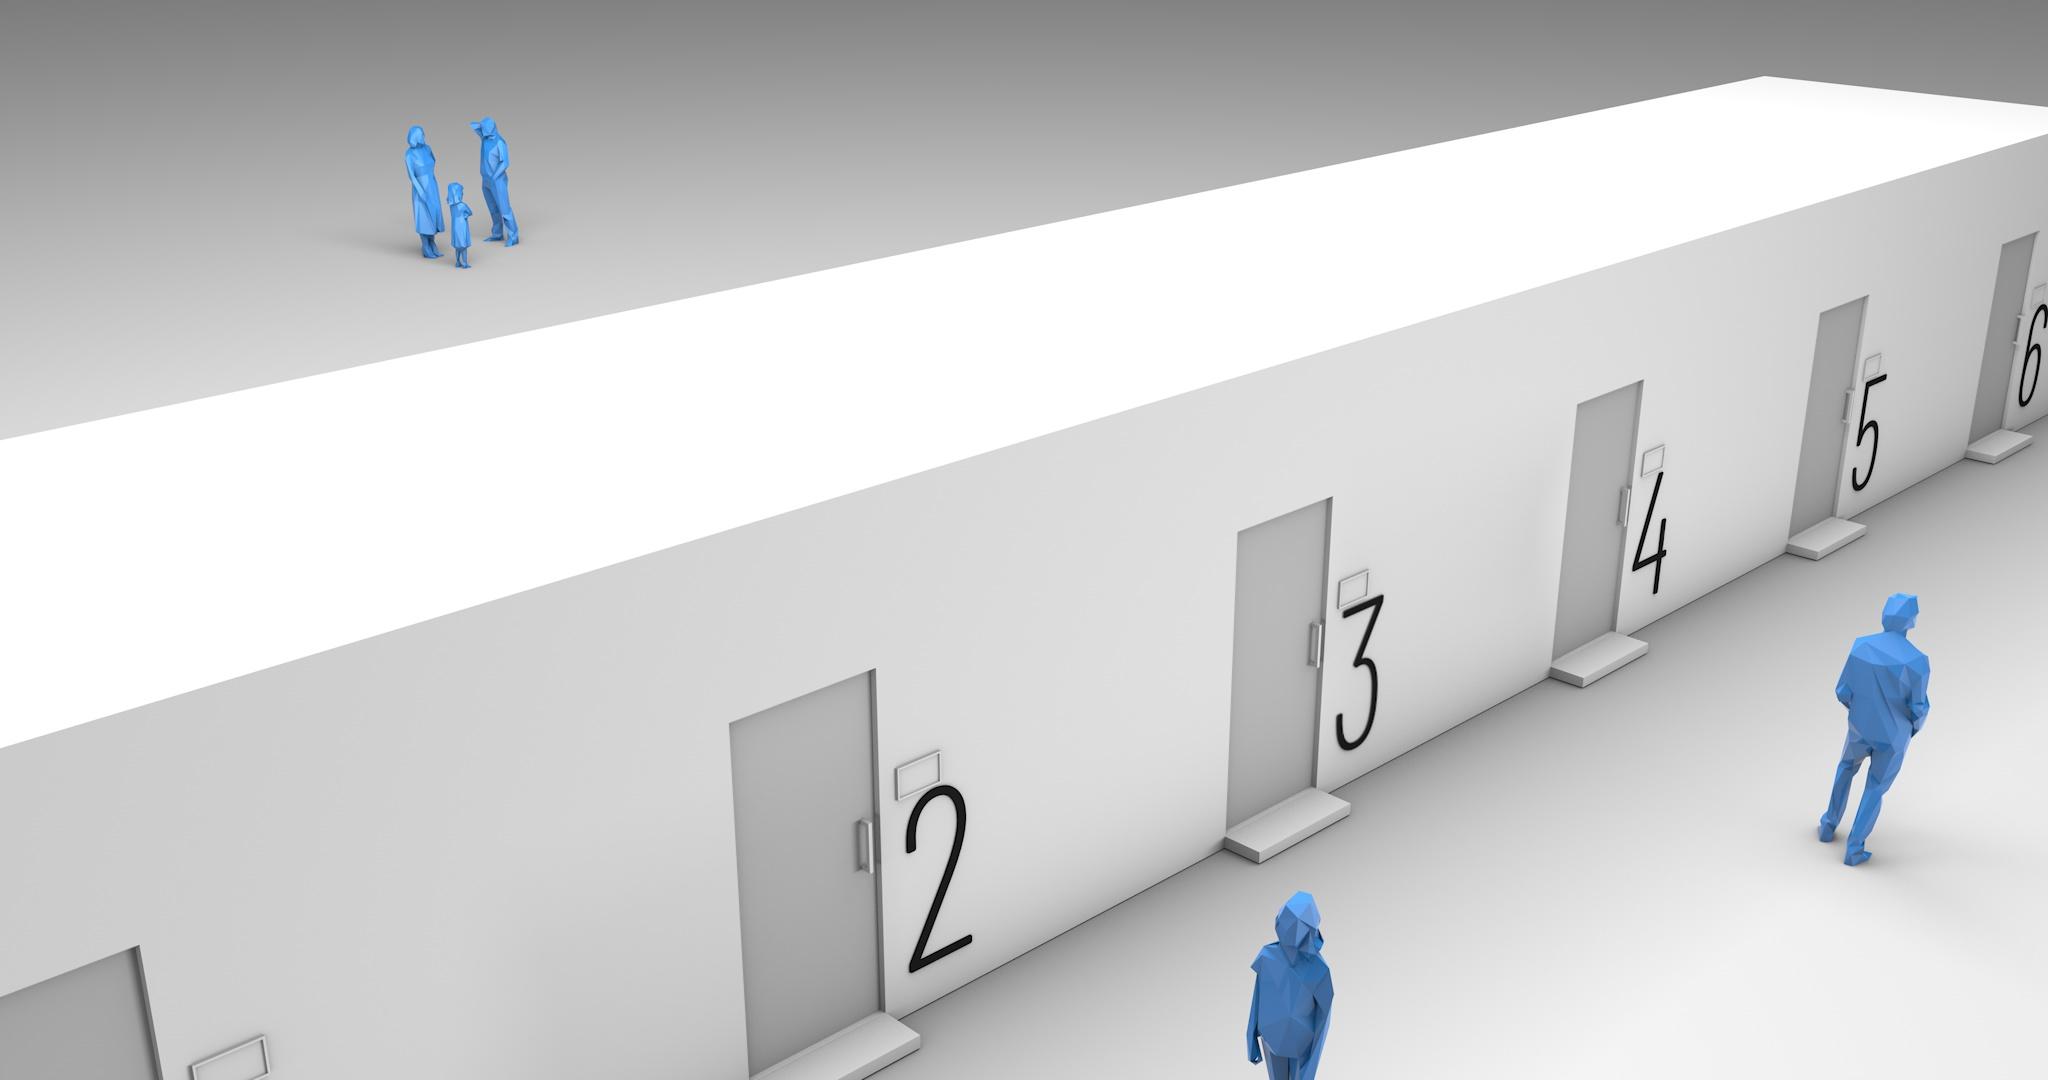 Immersive Room Concept Design